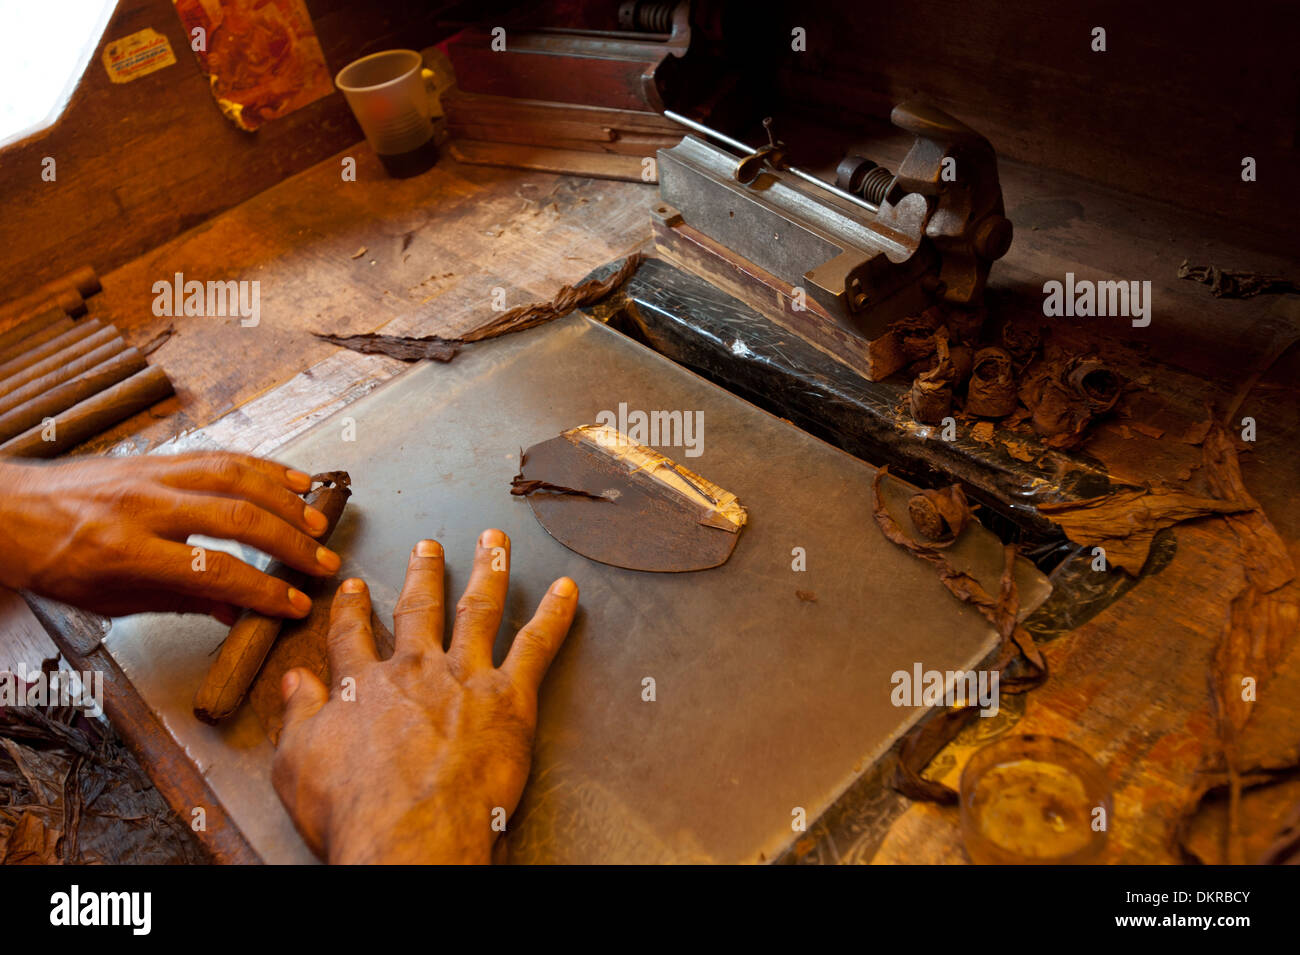 Dominikanische Republik, Produktion, Handwerk, Zigarren, Zigarre, Karibik, Santo Domingo, Tabak, Hände, Roll, Stockbild